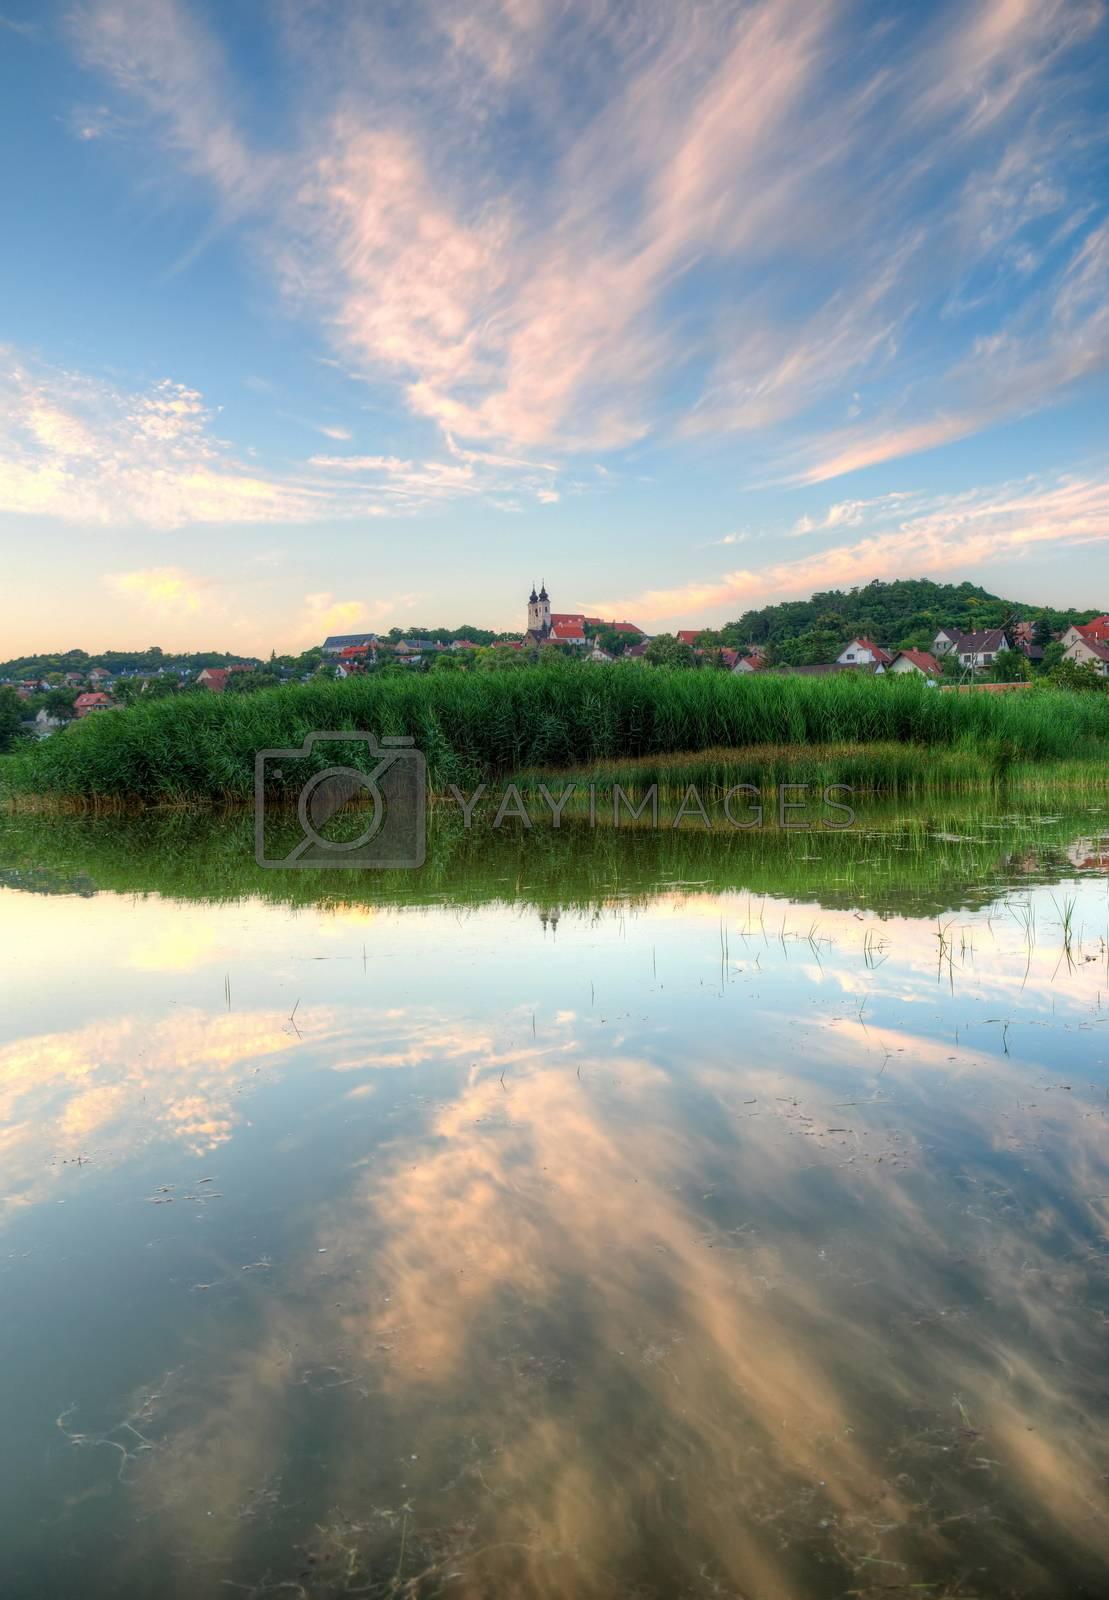 Royalty free image of Tihany abbey in Hungary at lake Balaton by anderm